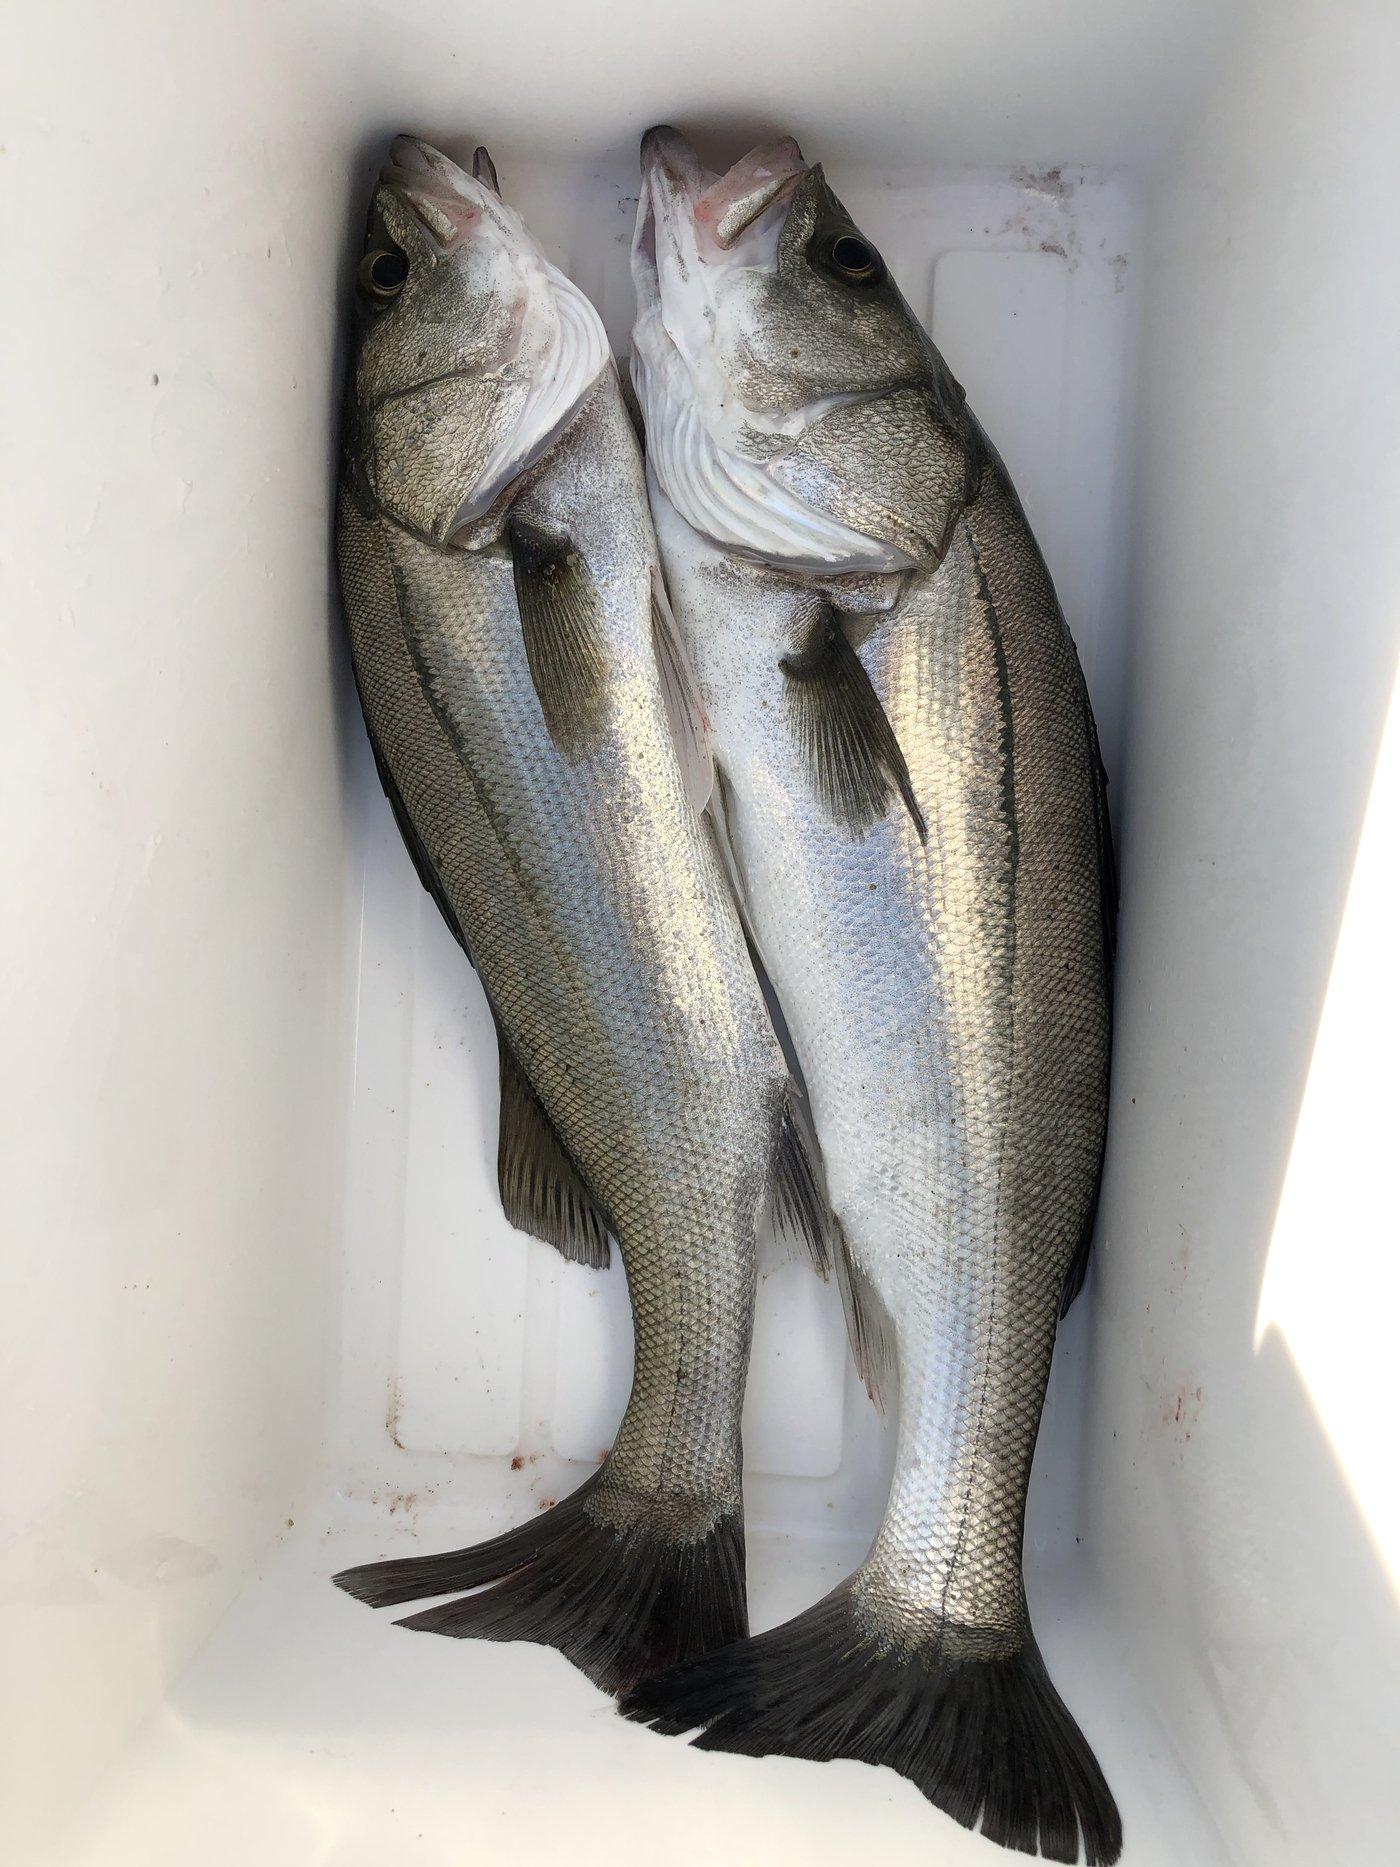 hikaruさんの投稿画像,写っている魚はスズキ